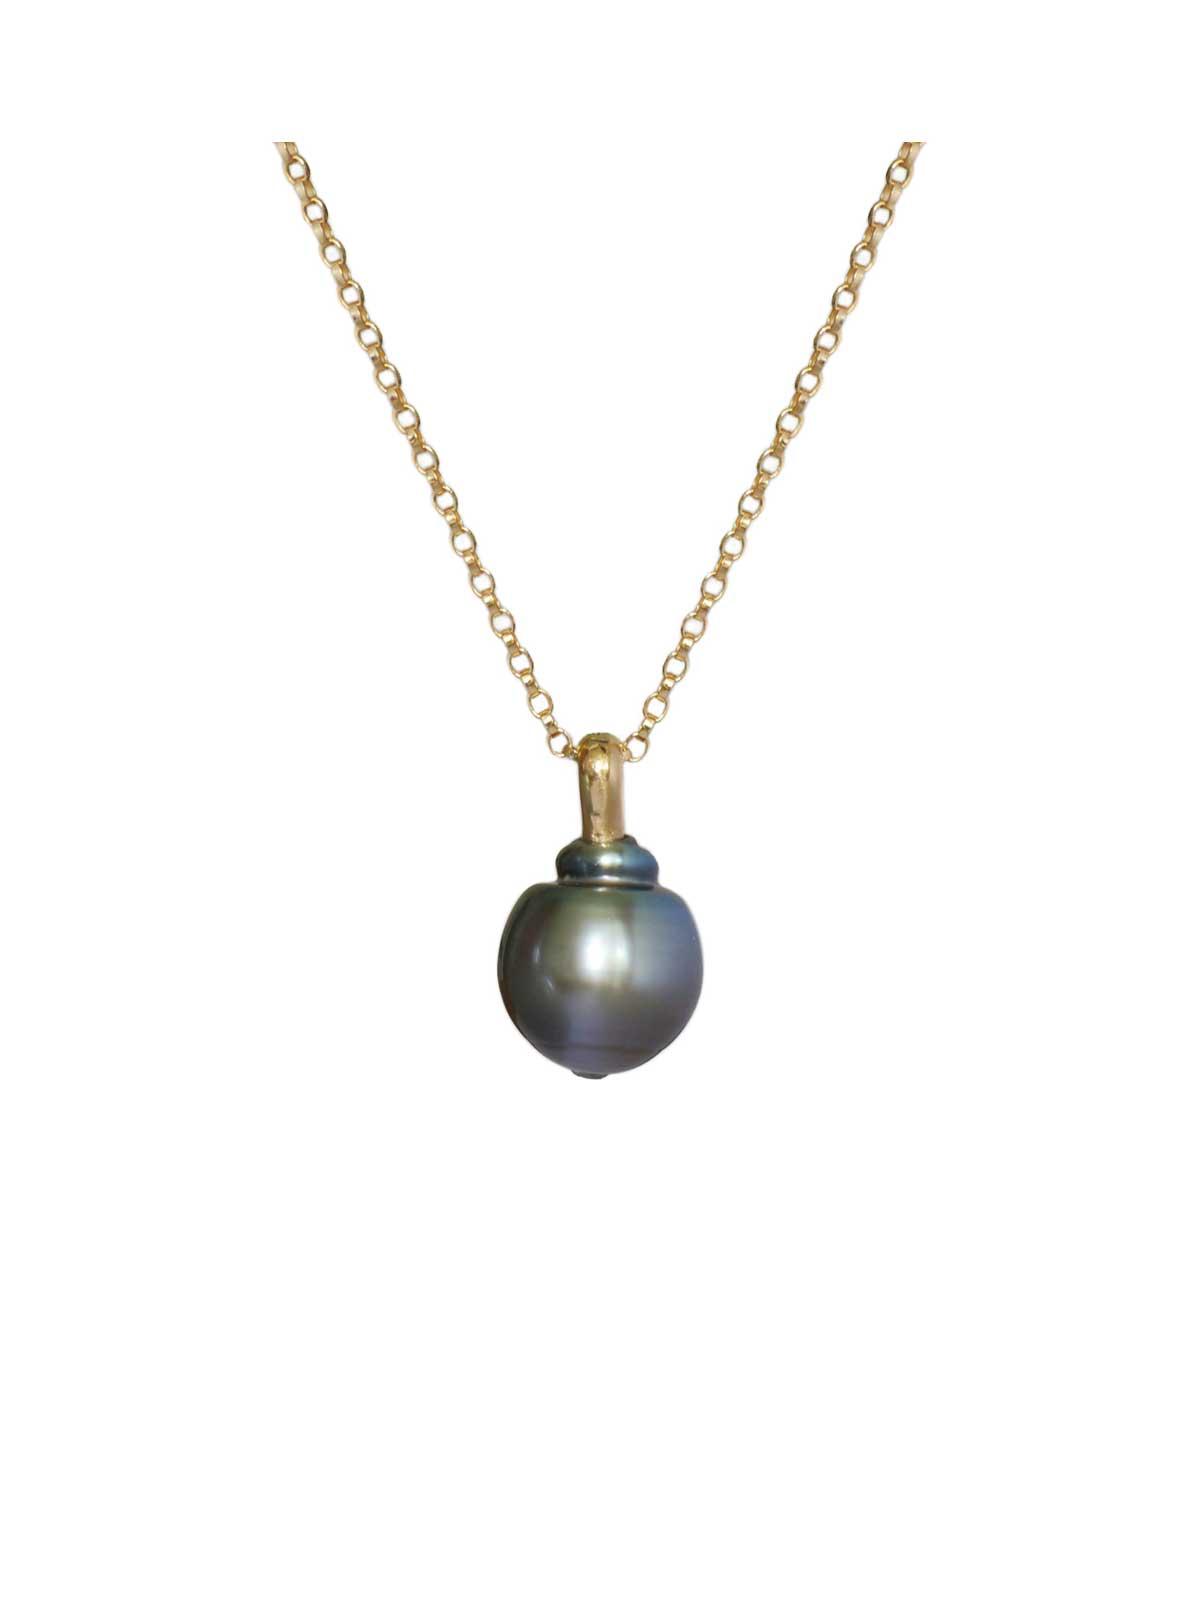 boudoir pendentif perle de tahiti Diamant or jaune 14 carats